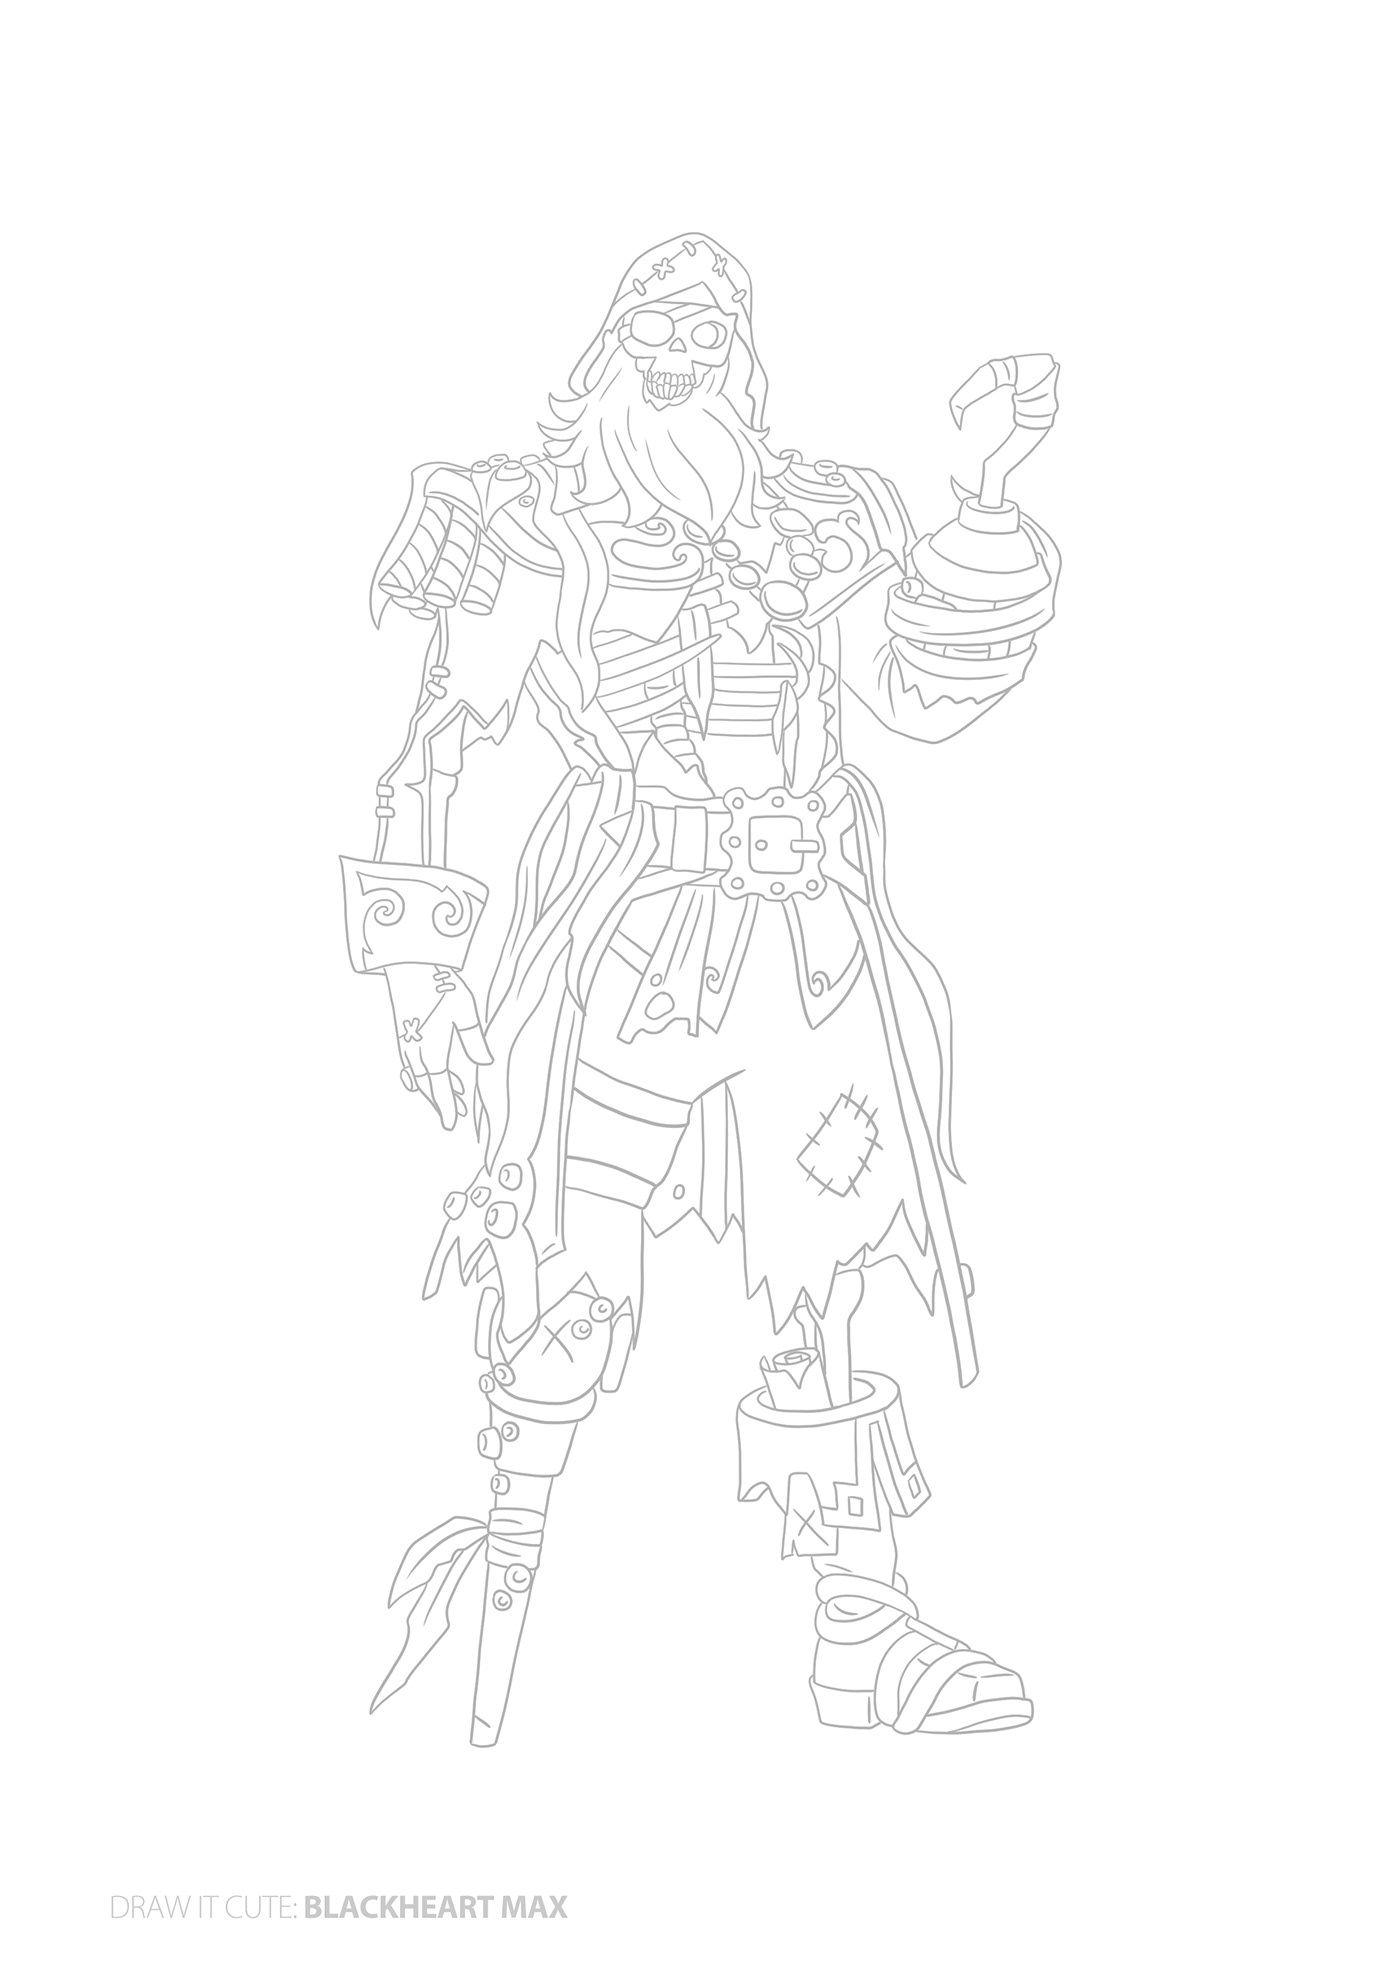 How To Draw Blackheart Max Fortnite Season 8 Tutorial On Behance Drawings Drawing Tutorial Sketches Tutorial